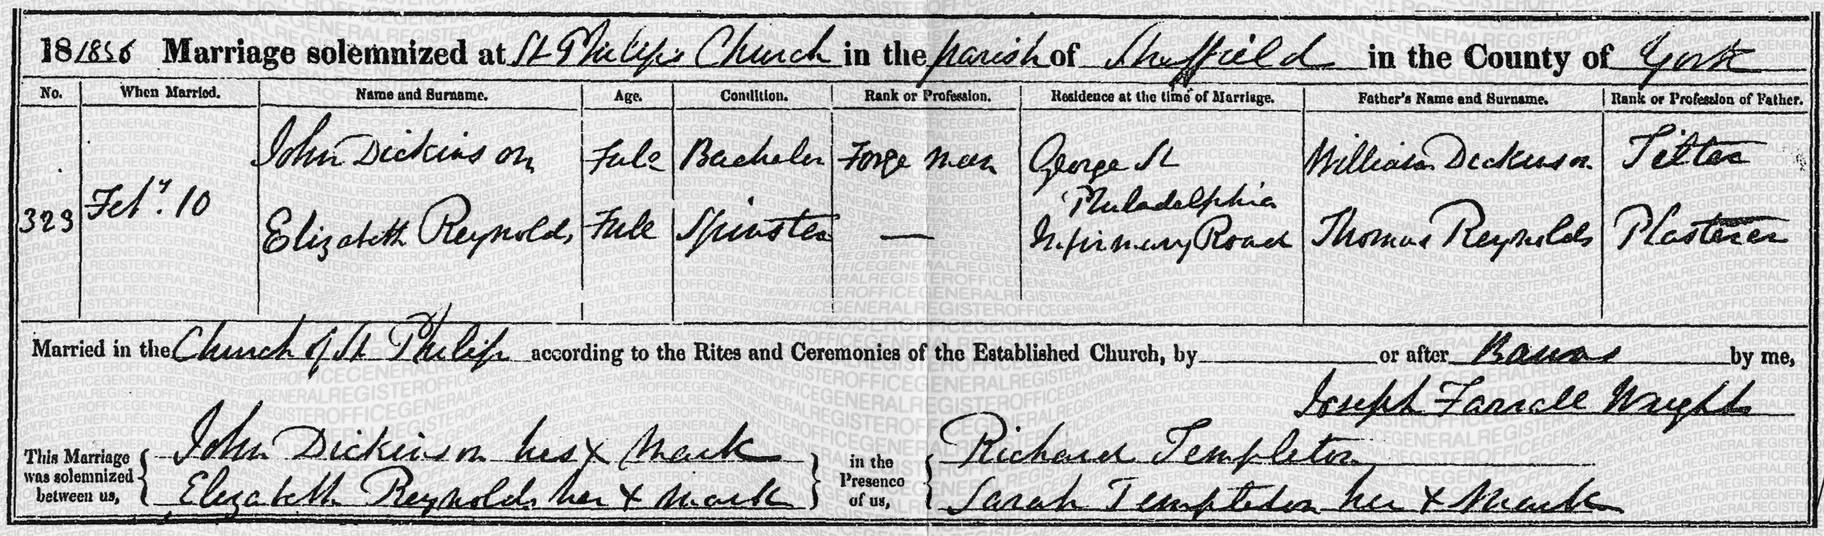 John Dickinson marriage license